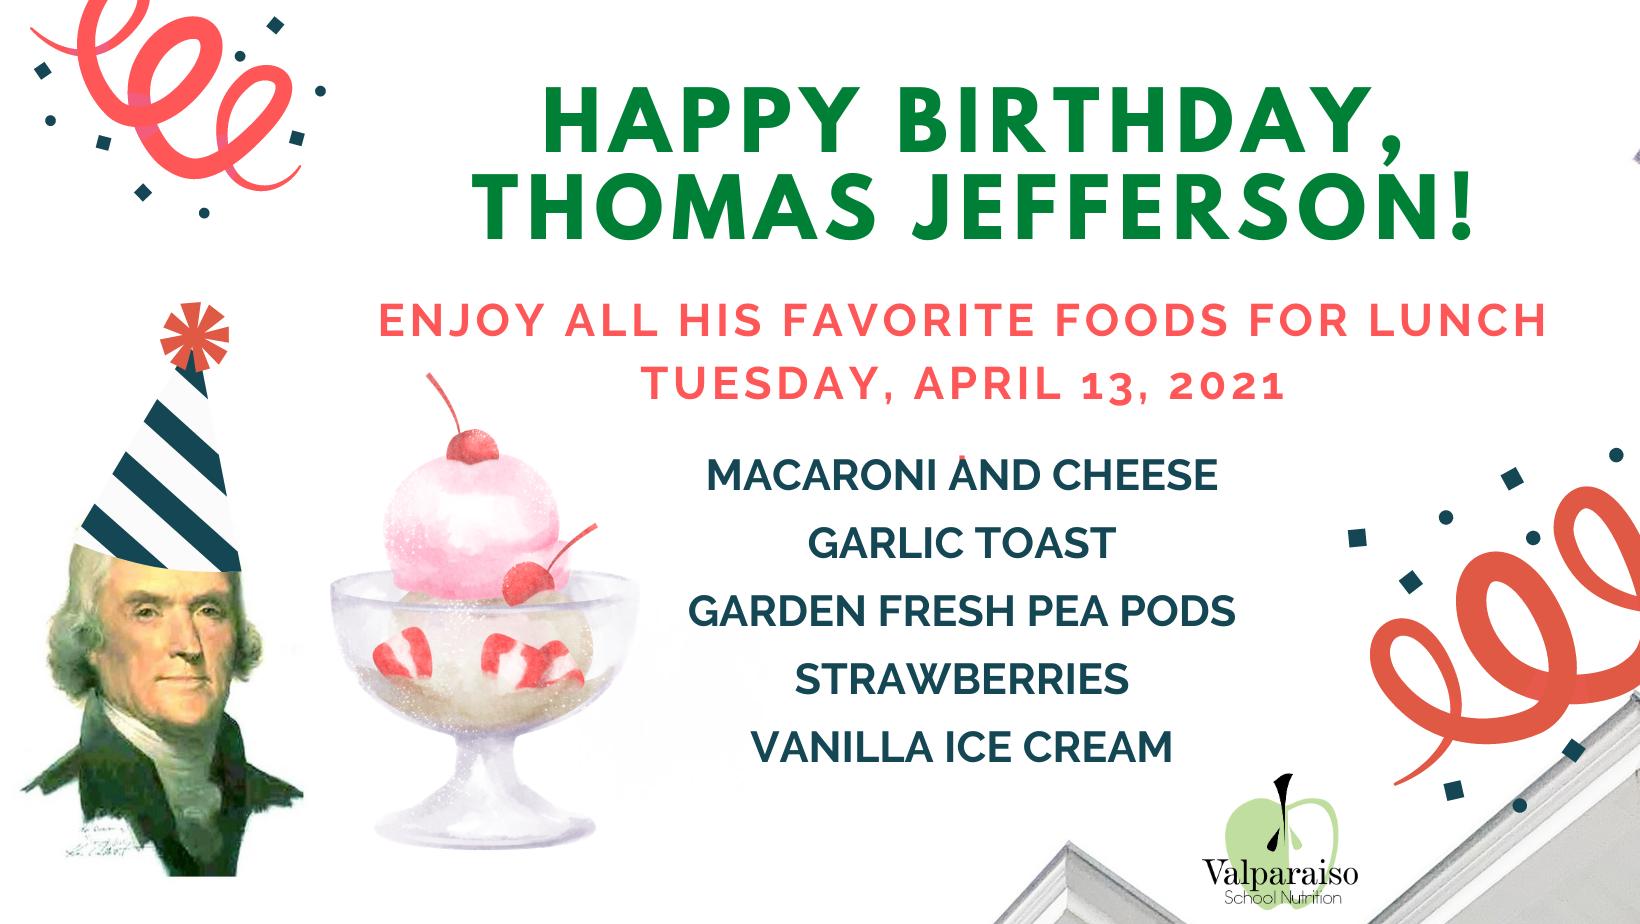 Birthday TJ